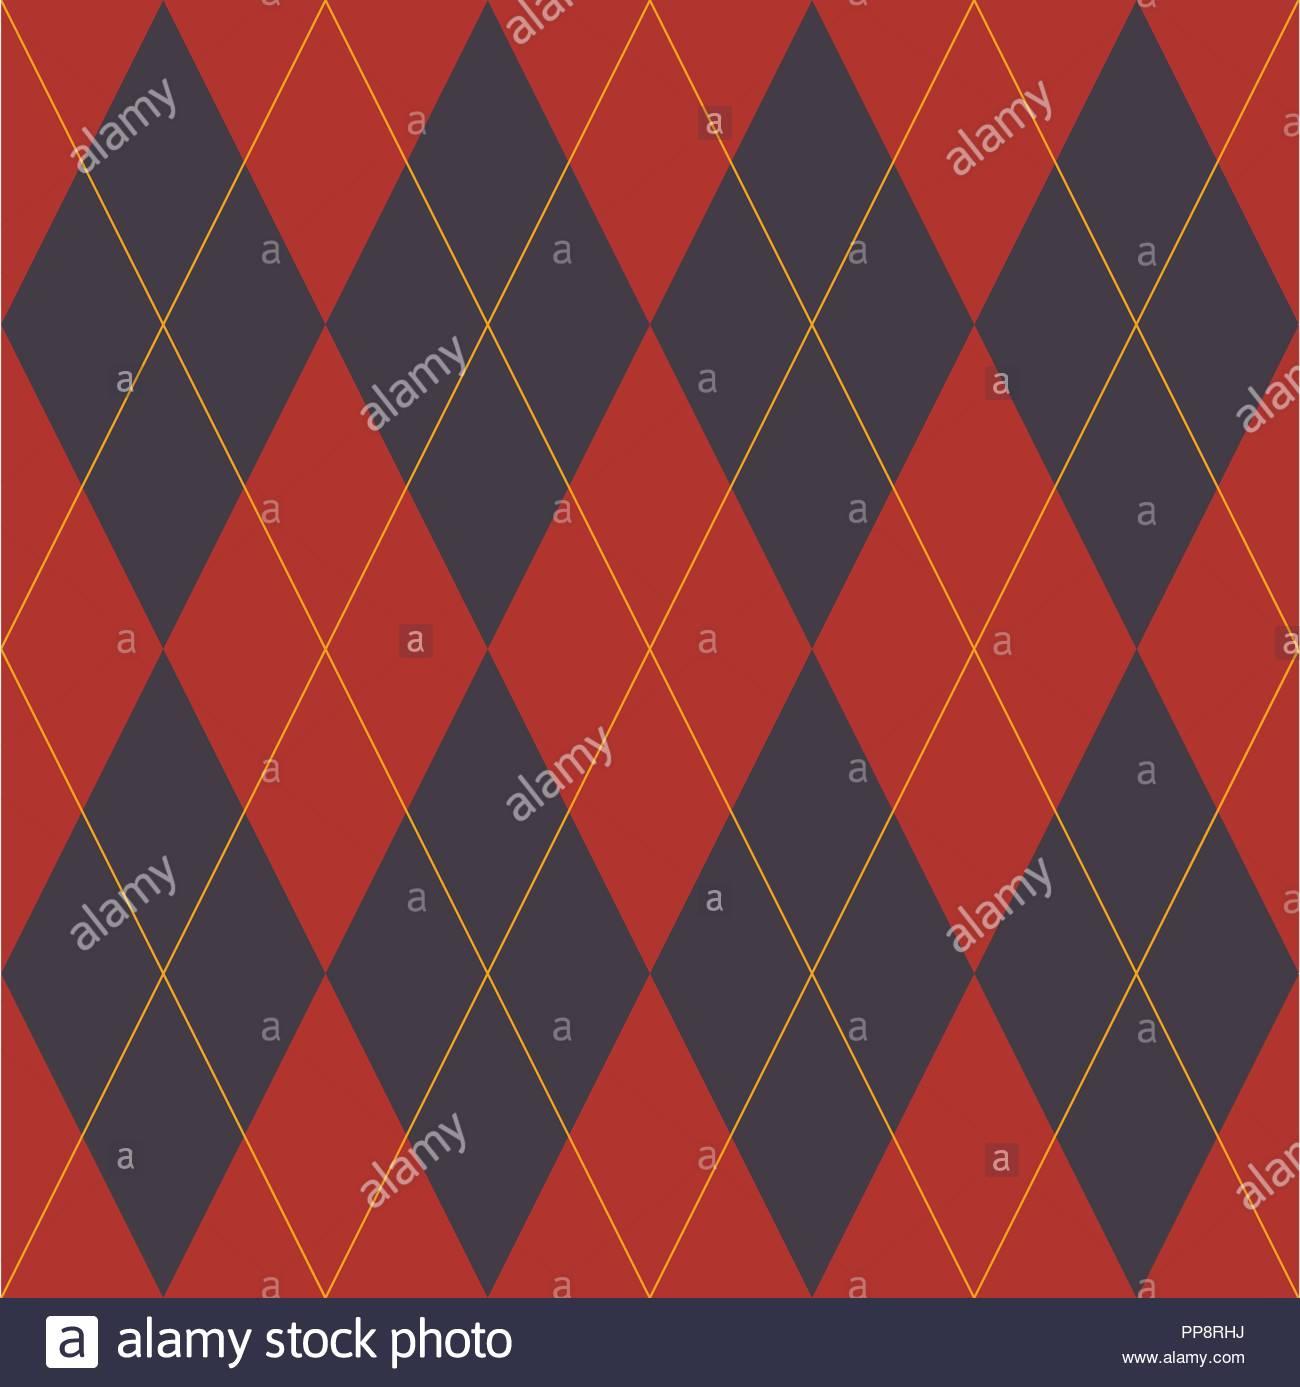 Lozenge - Geometric design for fabric - Stock Image